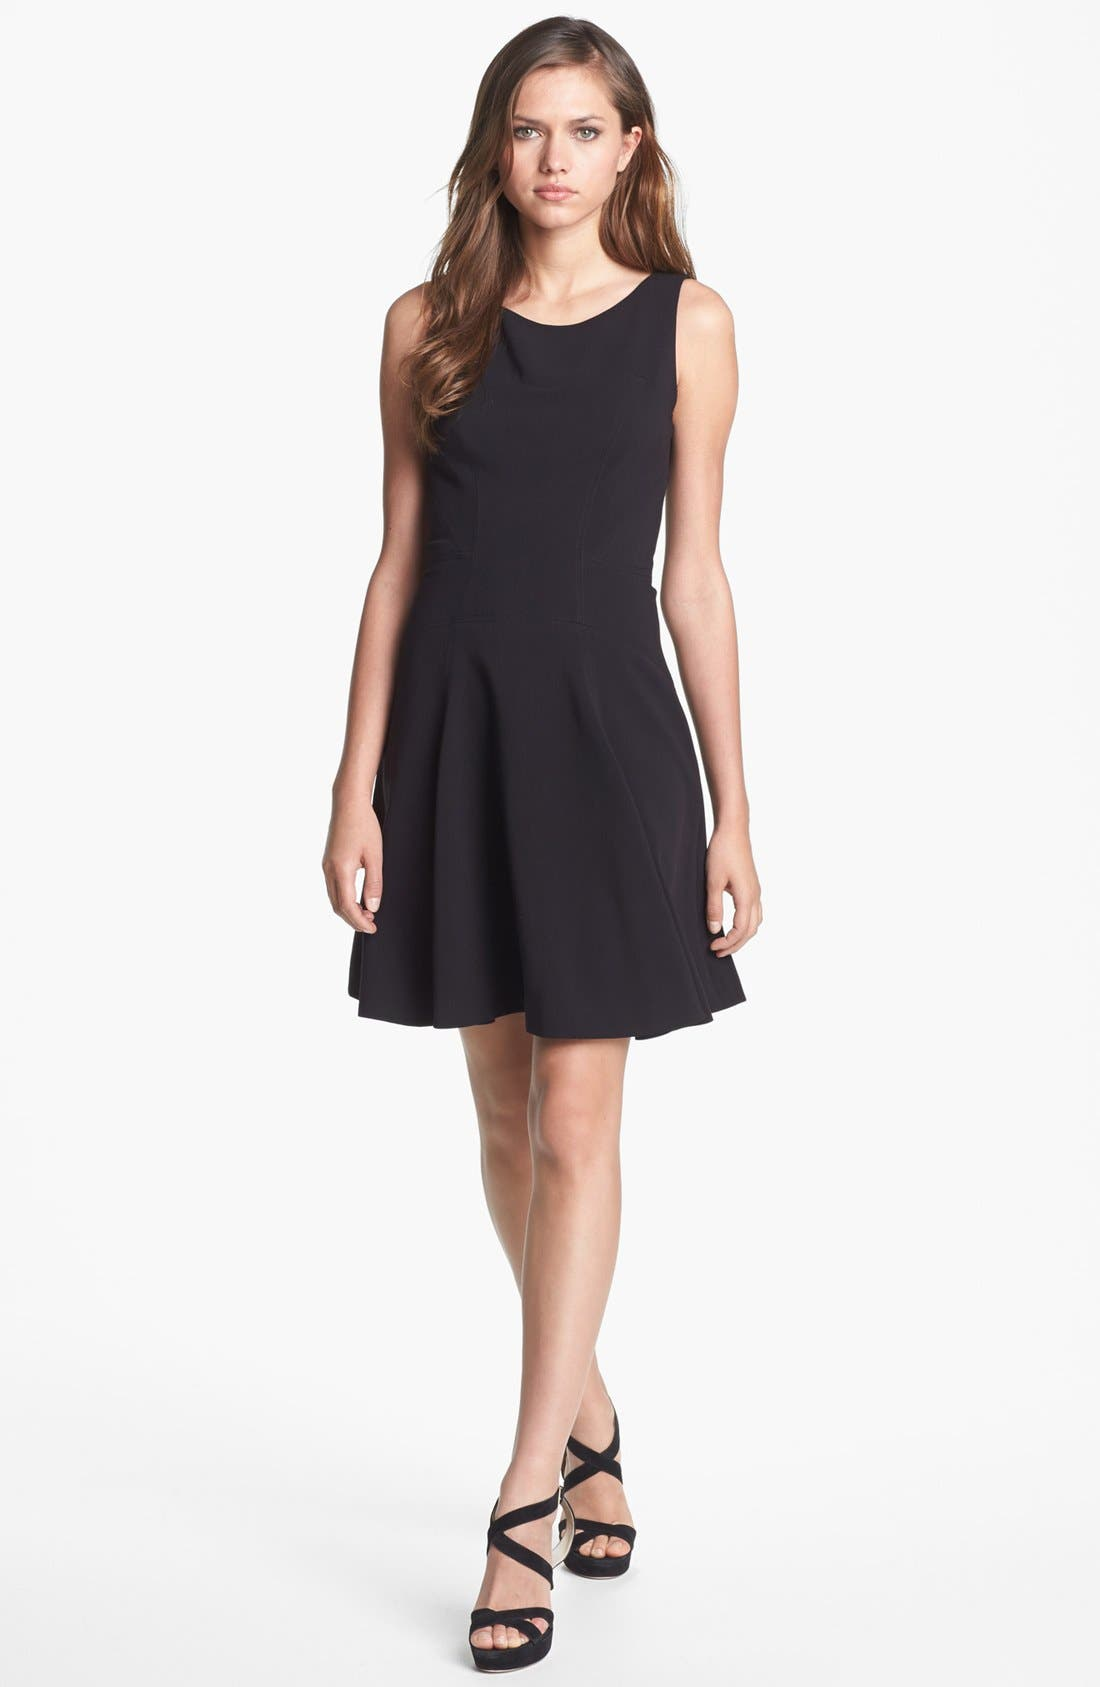 Alternate Image 1 Selected - Rachel Roy Paneled Fit & Flare Dress